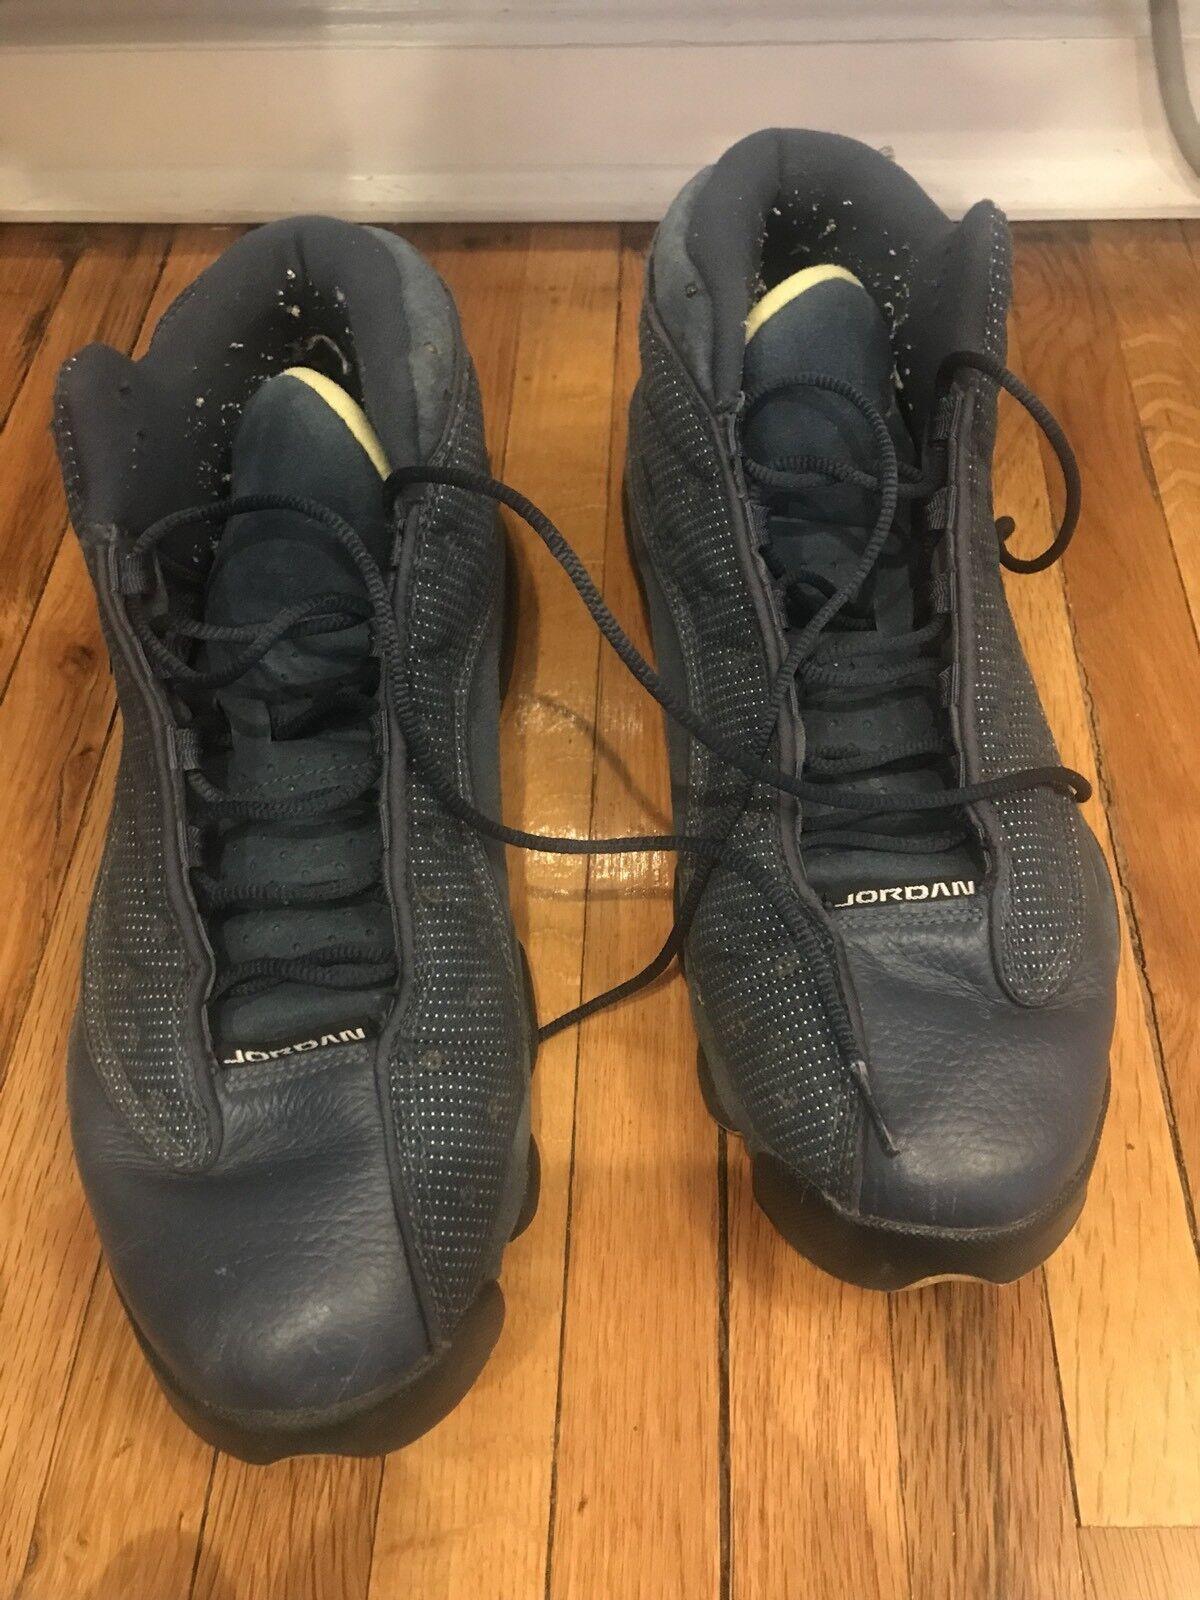 Nike Air Jordan Retro XIII 13 Squadron Blue limited Men Price reduction Seasonal clearance sale